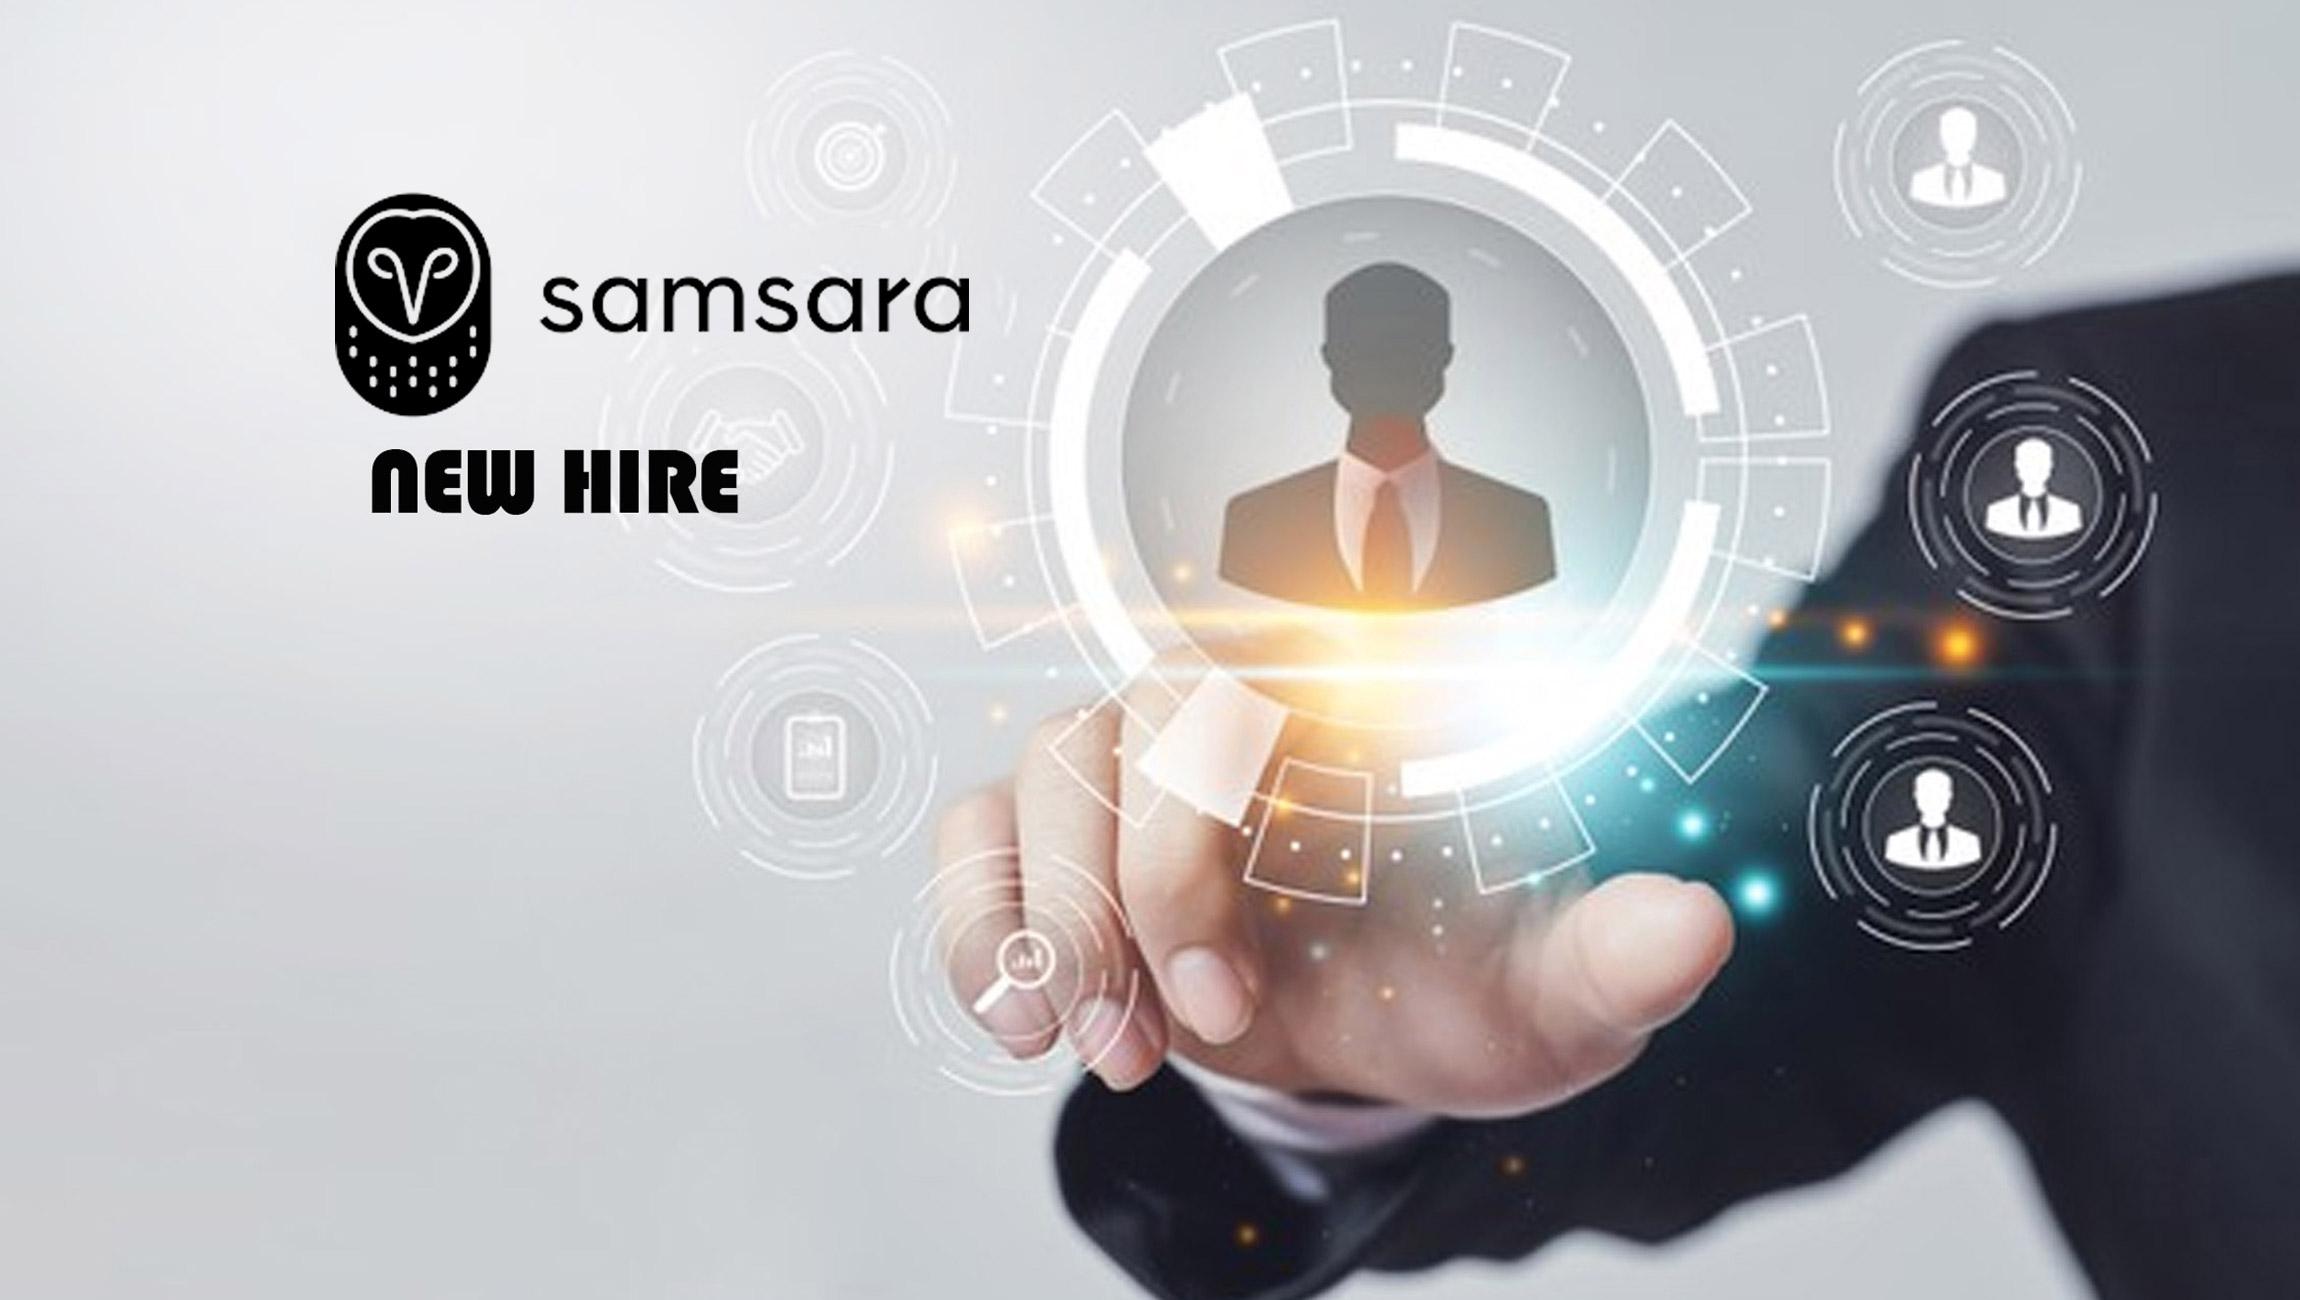 Ann M. Livermore Joins Samsara's Board of Directors